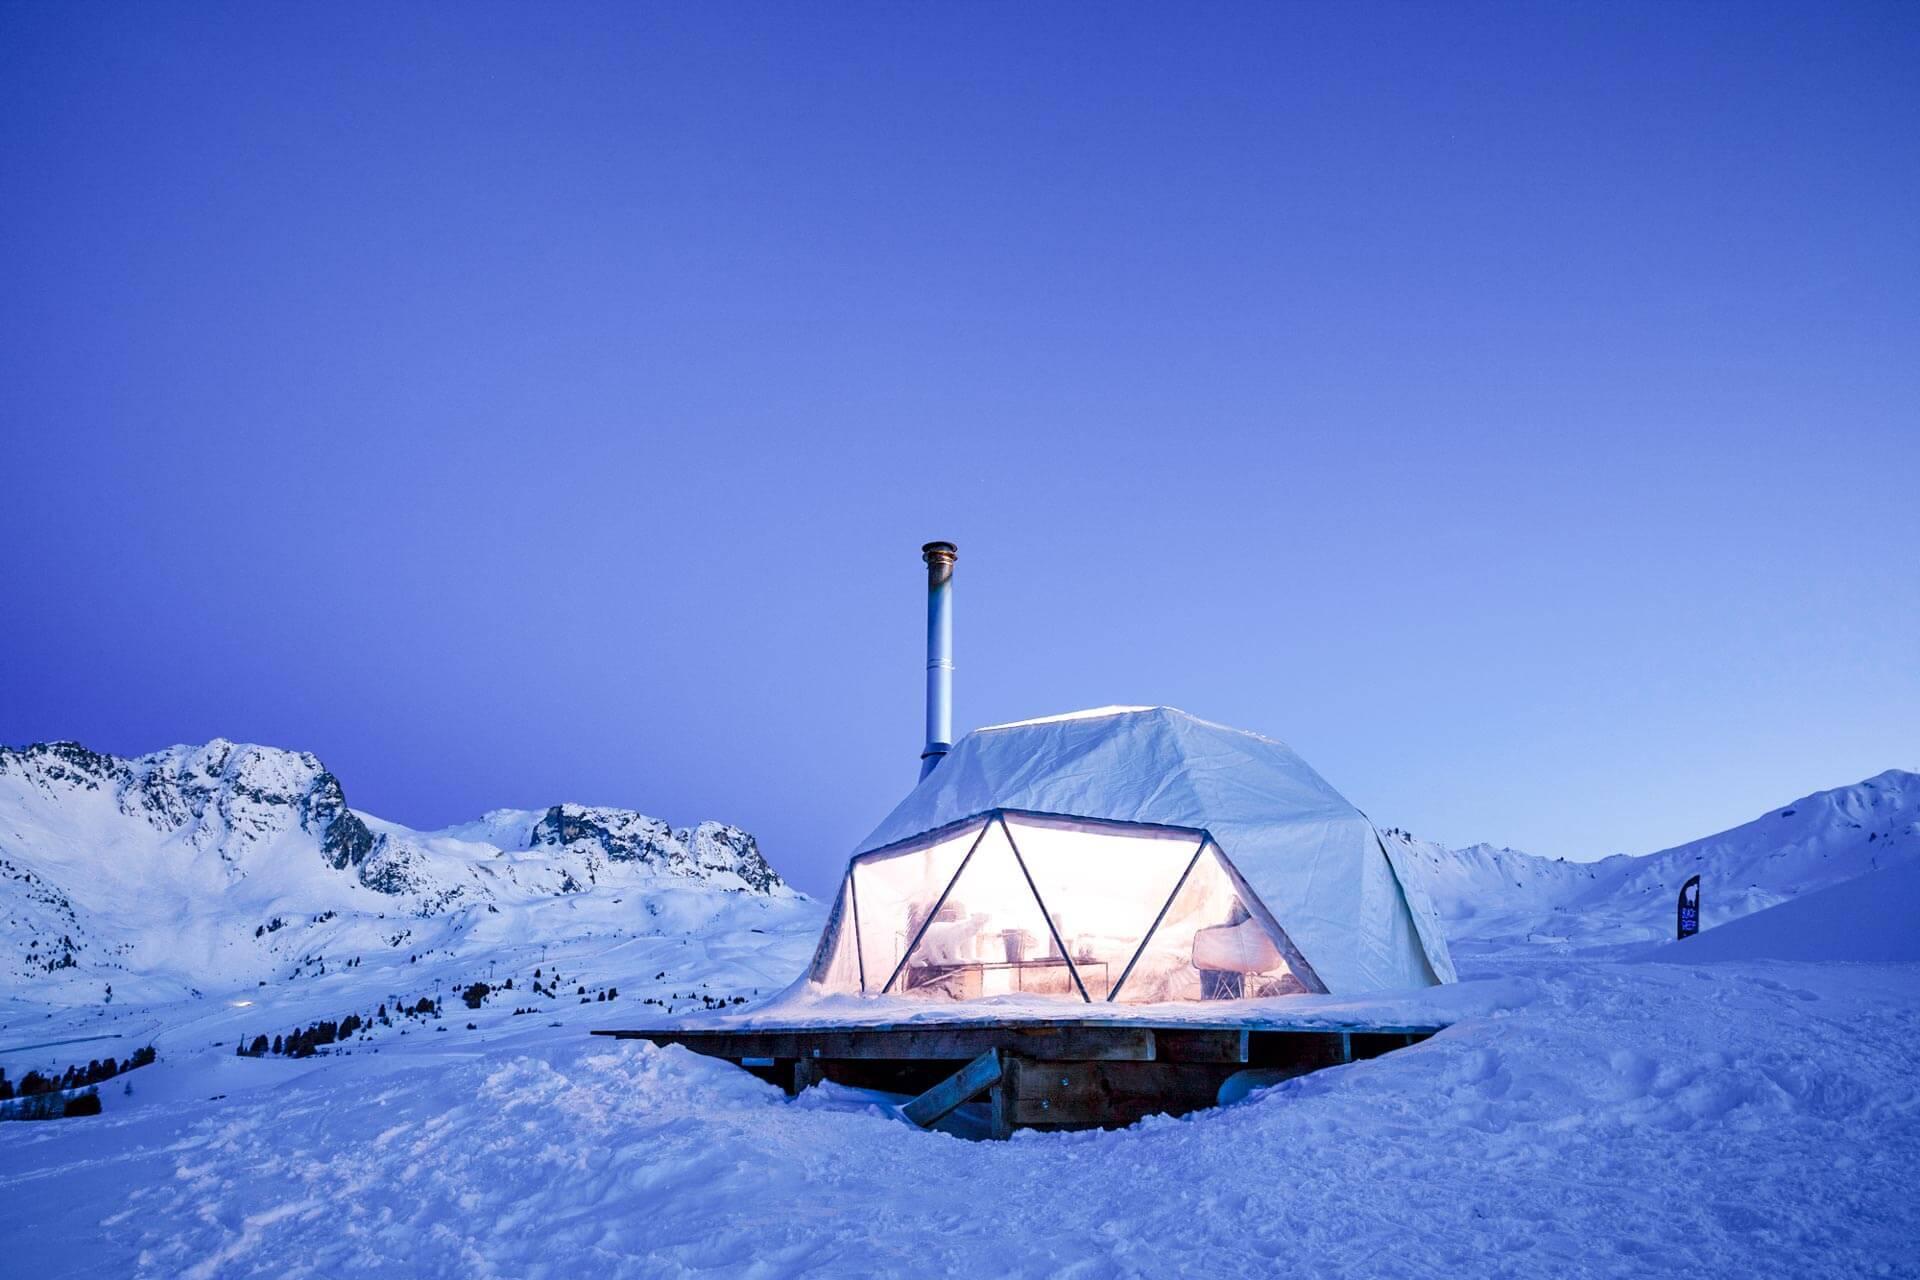 Passer une nuit au sommet dans un igloo © Elina Sirparanta